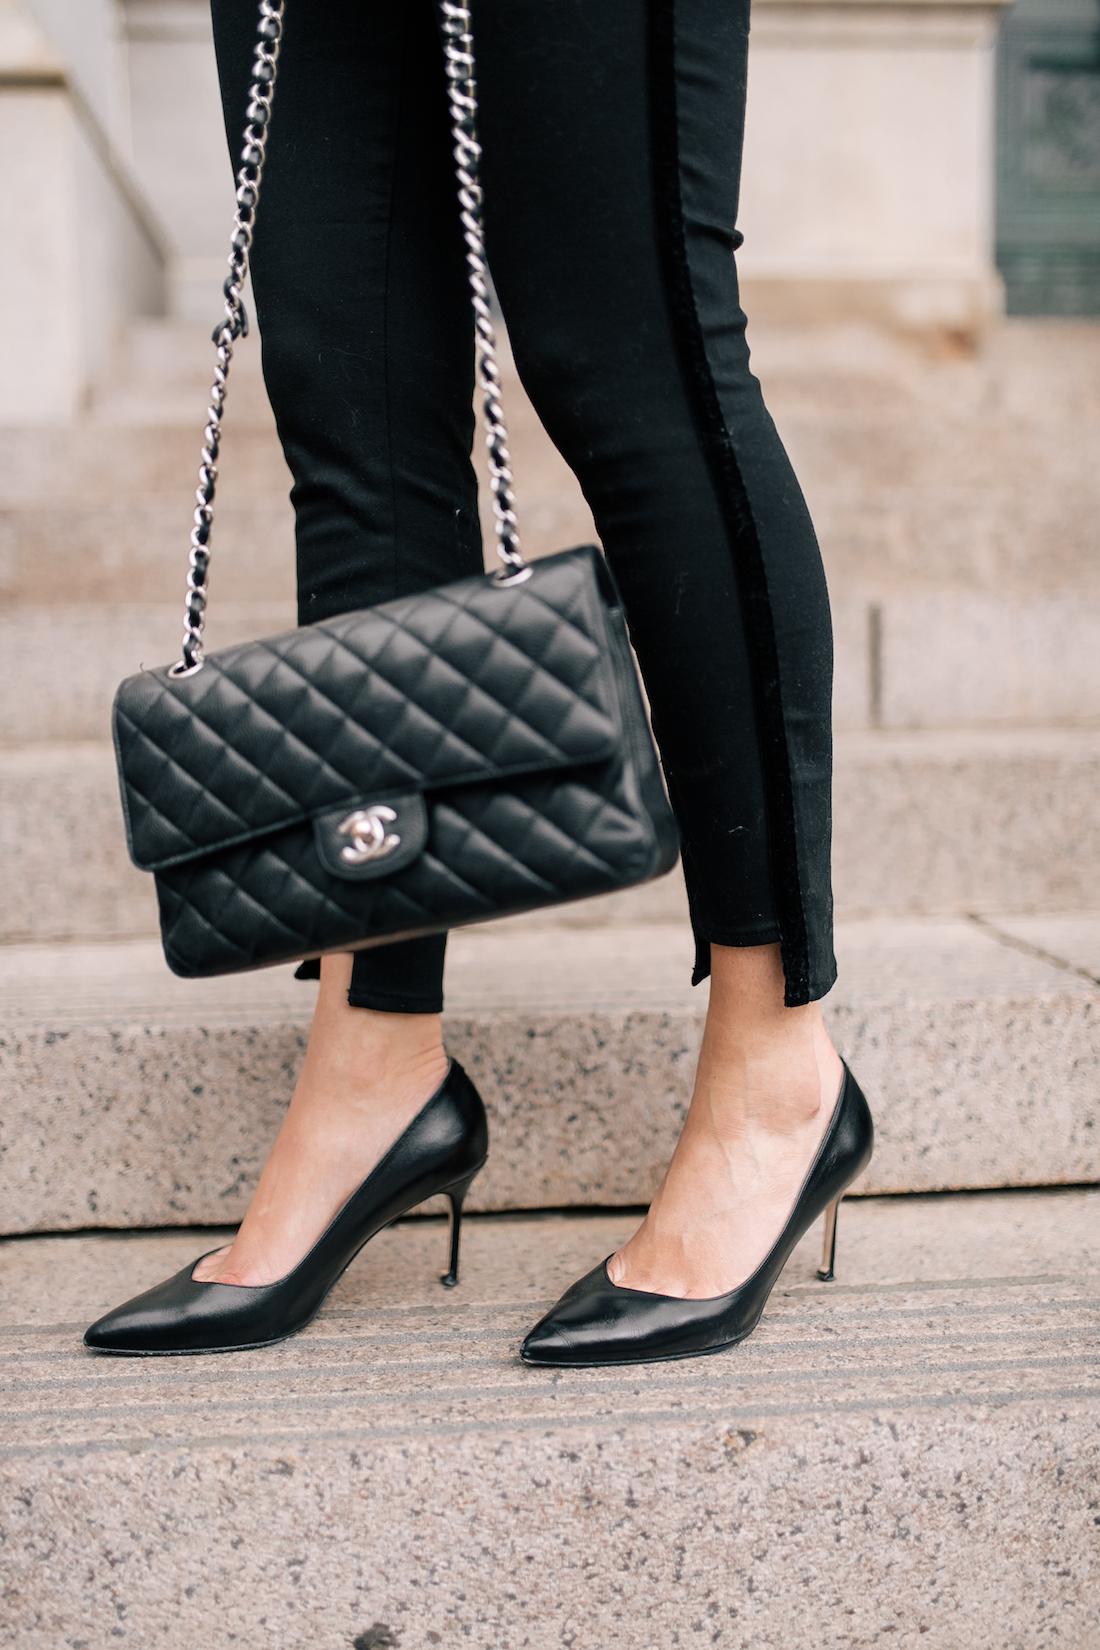 Chanel Bag & The Perfect Pump - Sarah Flint